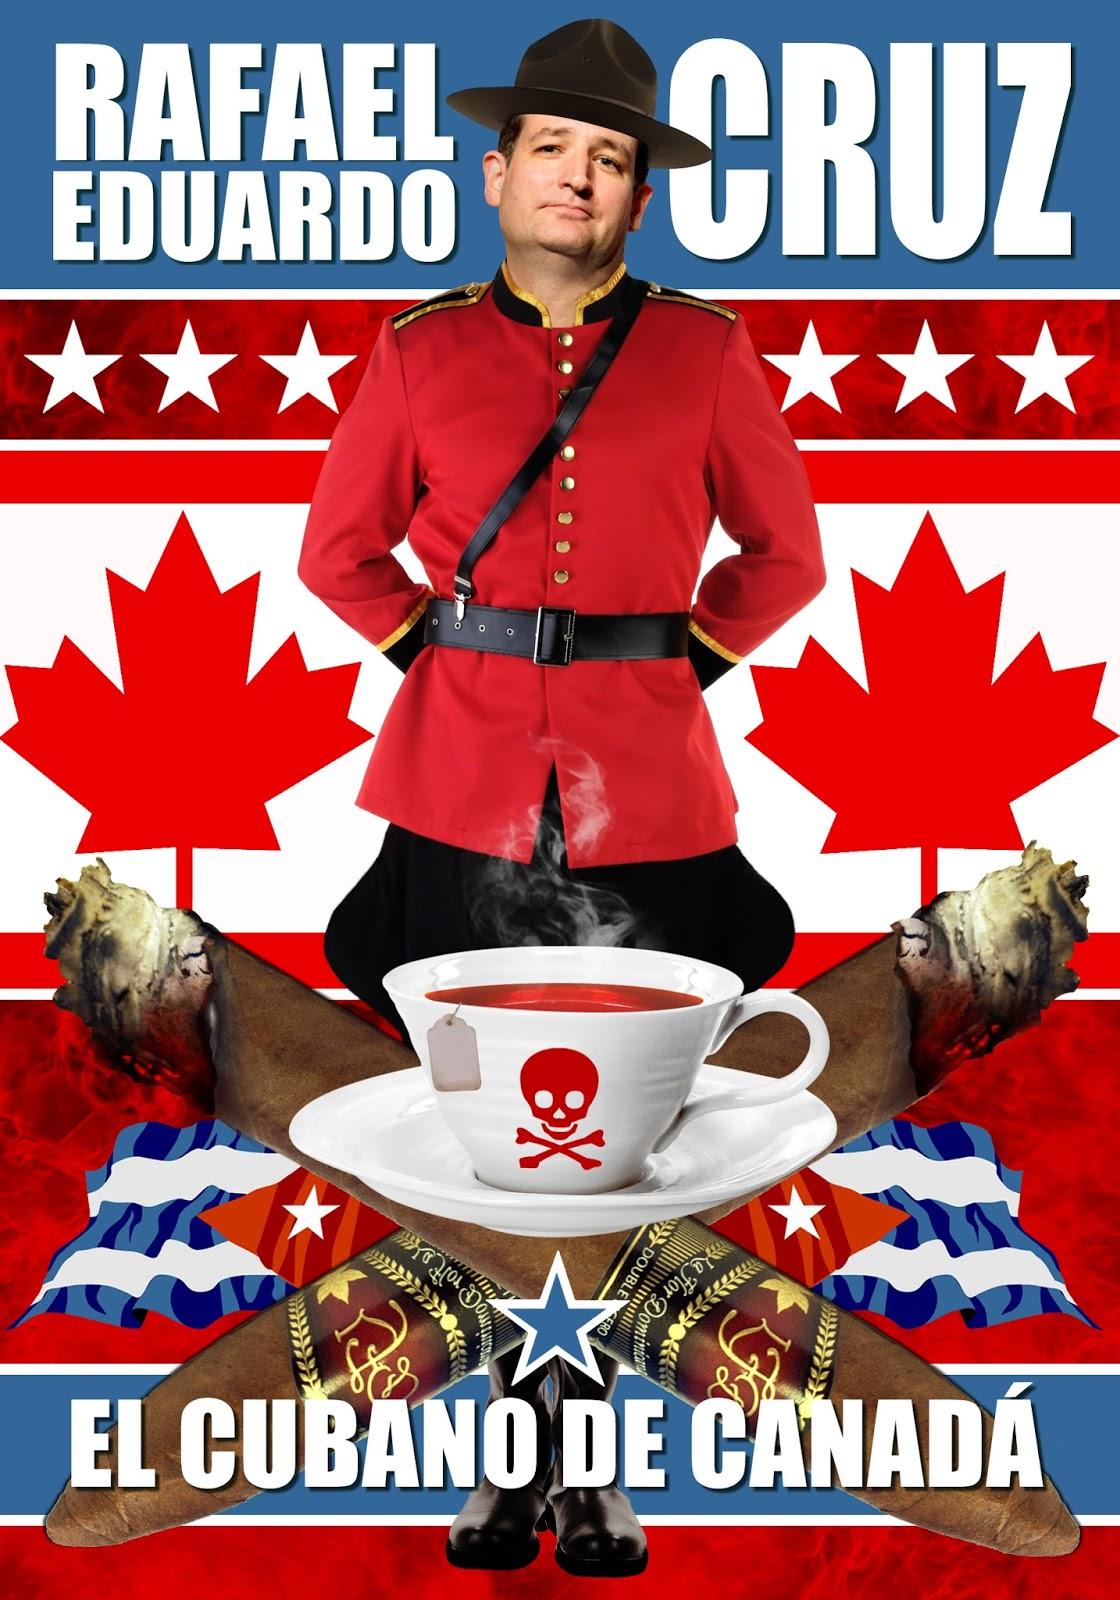 http://4.bp.blogspot.com/-Rq9tK7ZueJs/UjNk6HNtYTI/AAAAAAAAvL4/V6to5TALGbo/s1600/Ted_Cruz_El_Cubano_De_Canada%CC%81_LARGE.jpg